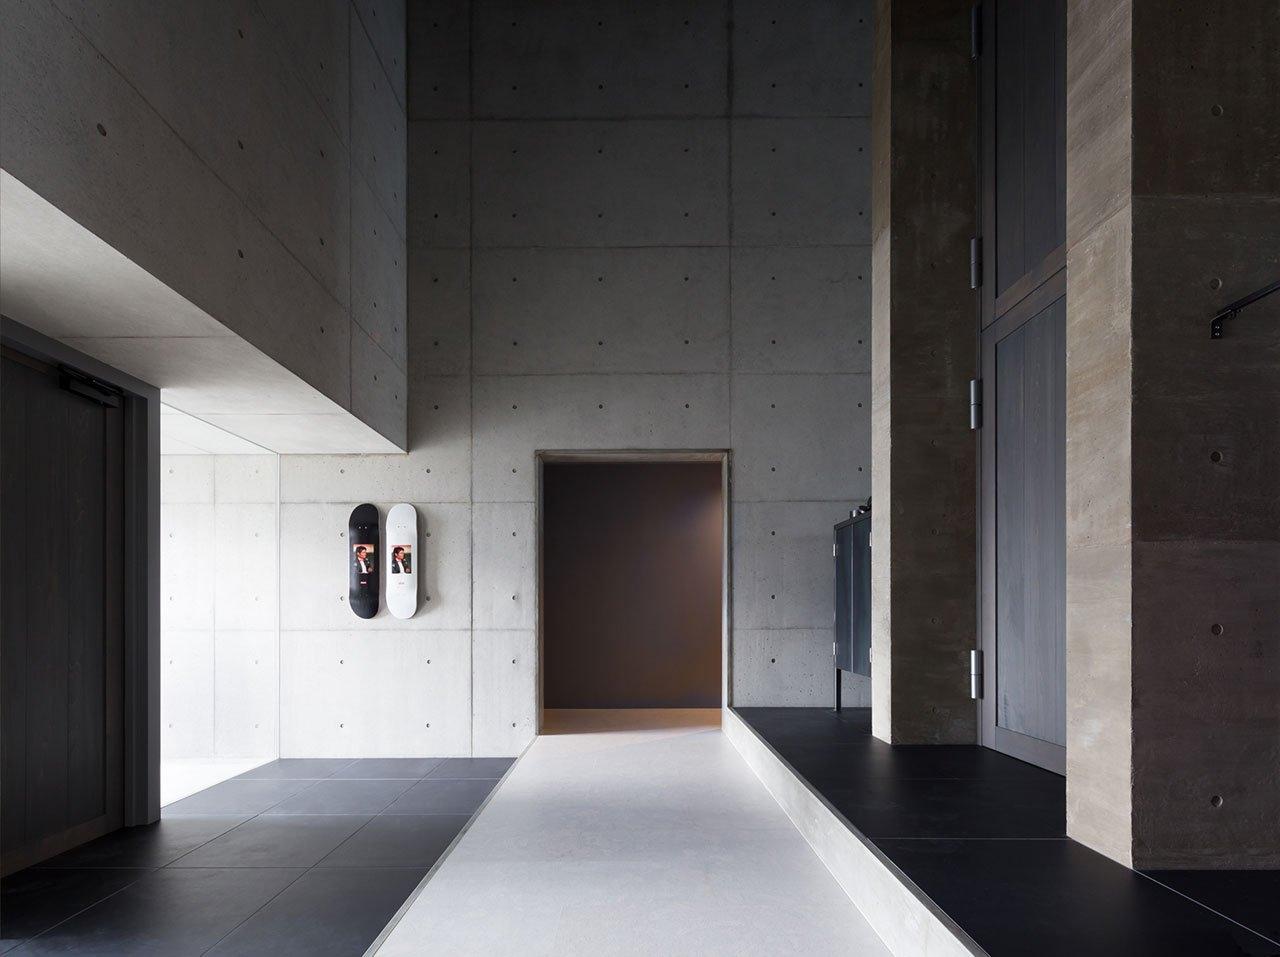 Designed FORM/Kouichi Kimura Ar - minimalissimo | ello